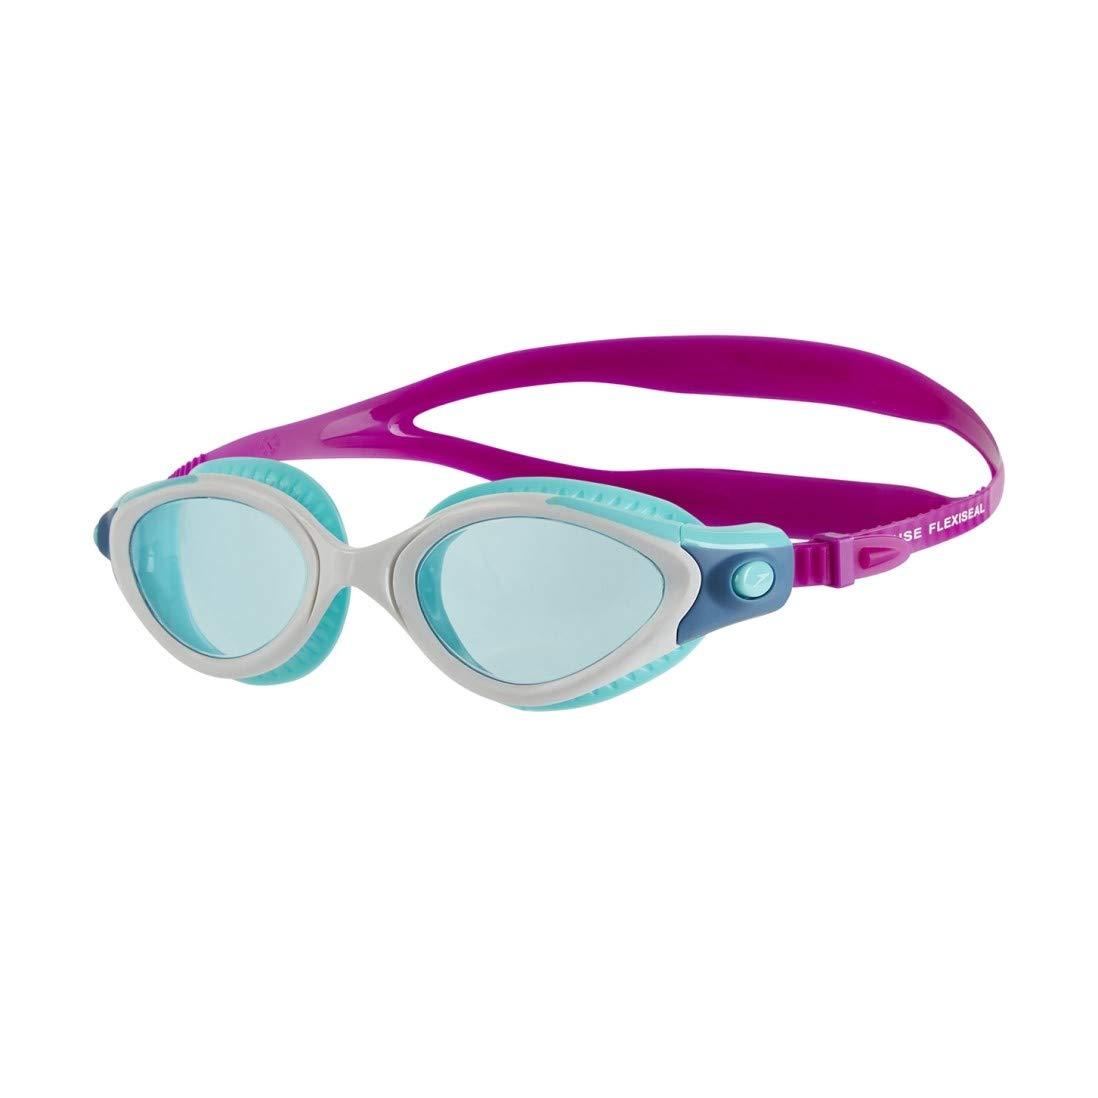 Speedo Futura Biofuse Flexiseal Gafas de Natación, Mujer